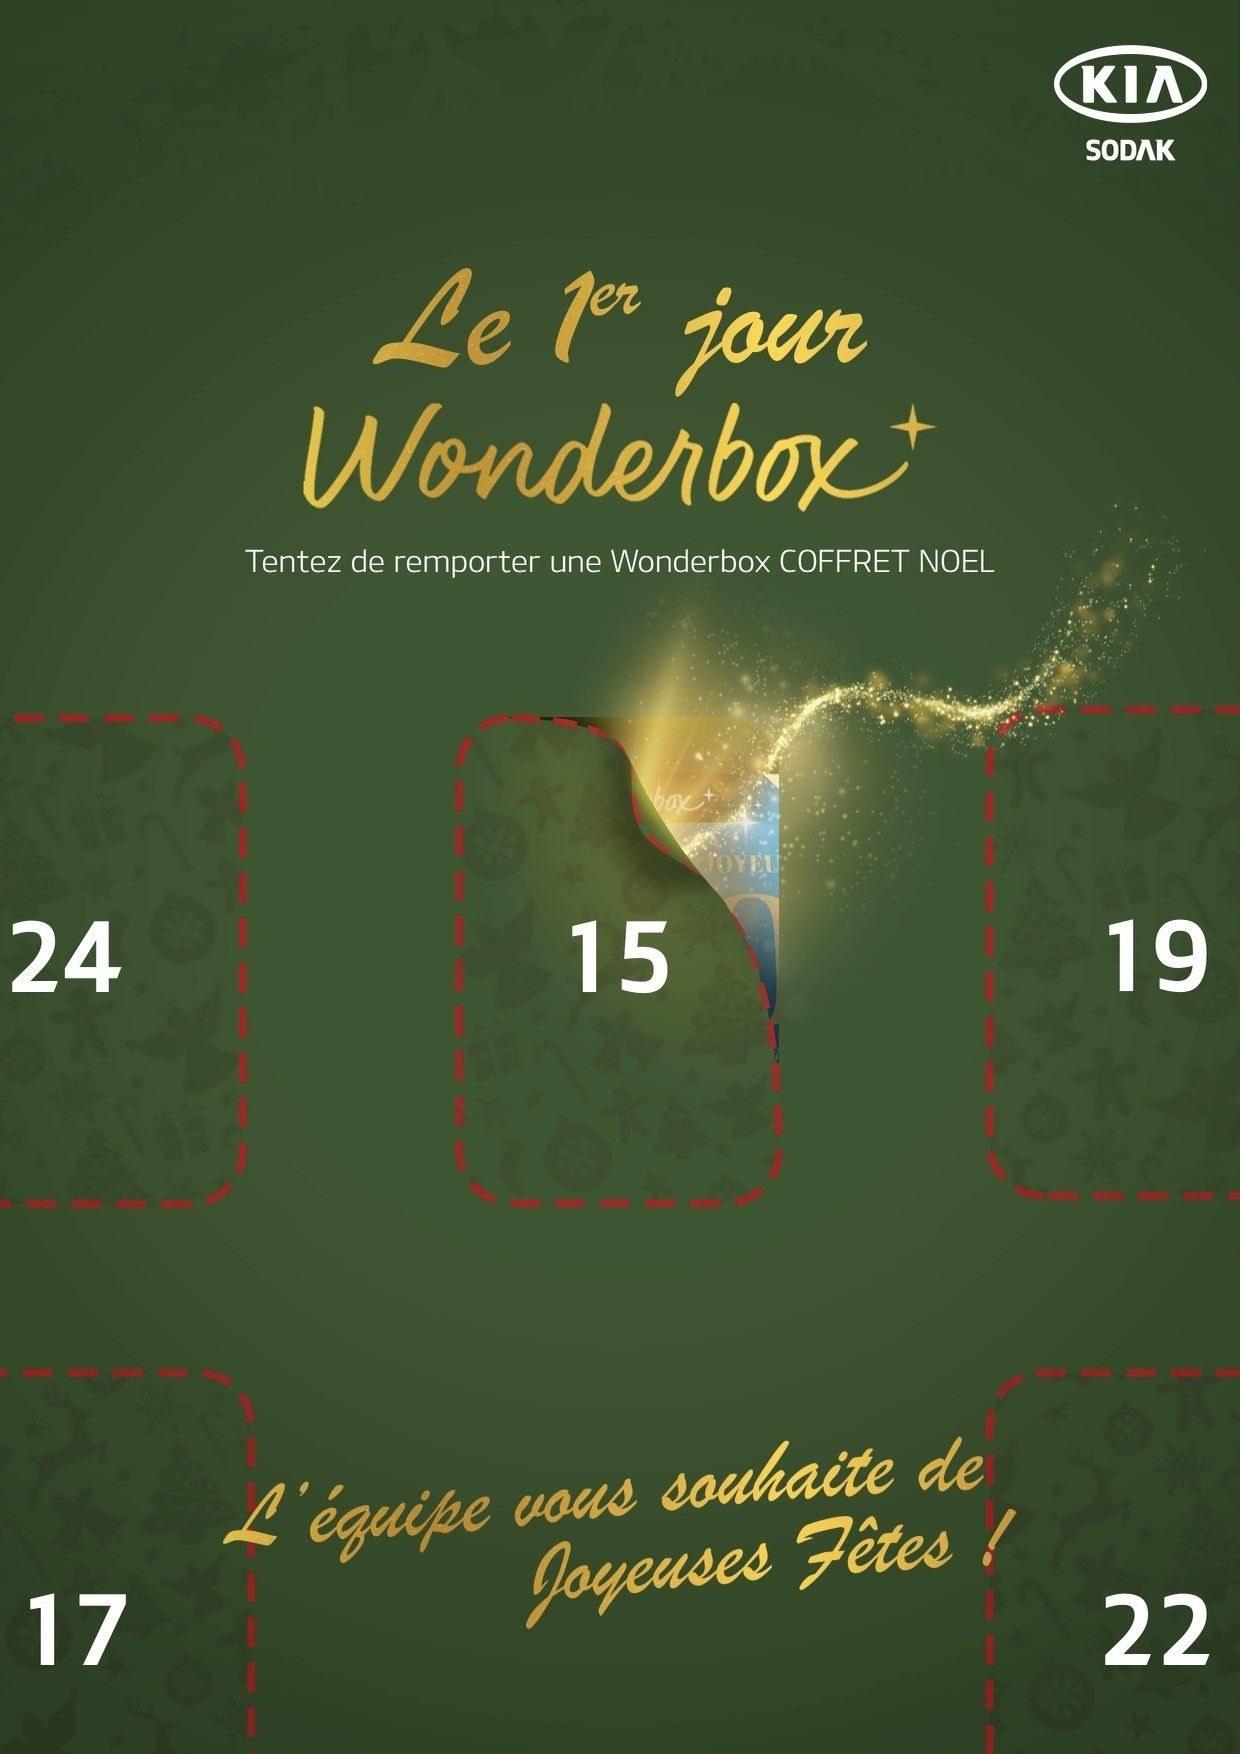 10 jours wonderbox